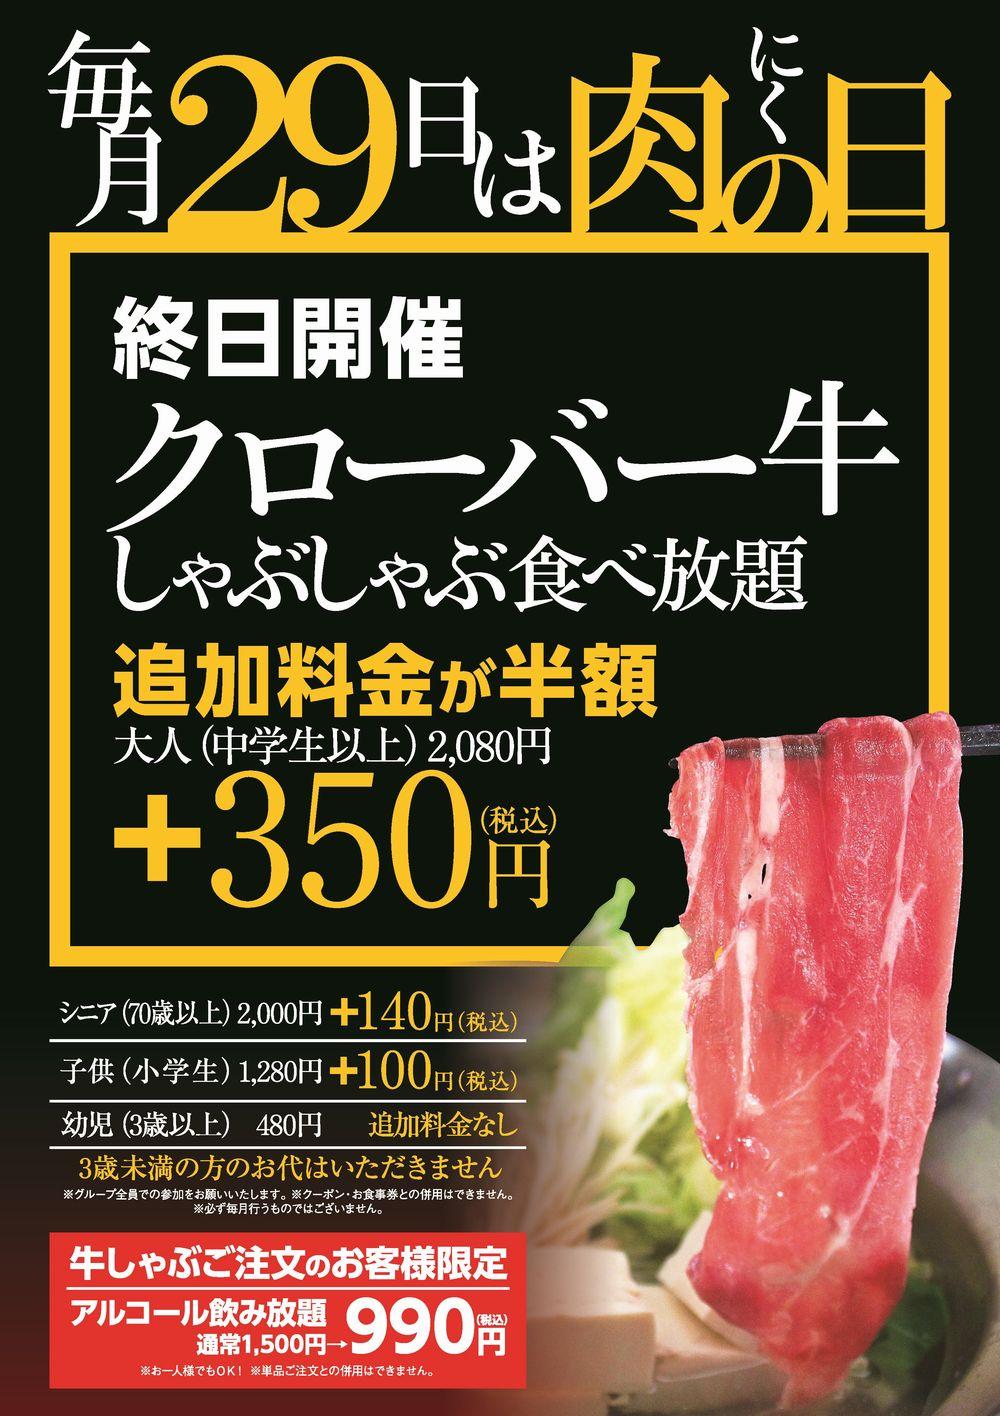 Roan肉の日ポスターA1 (1)